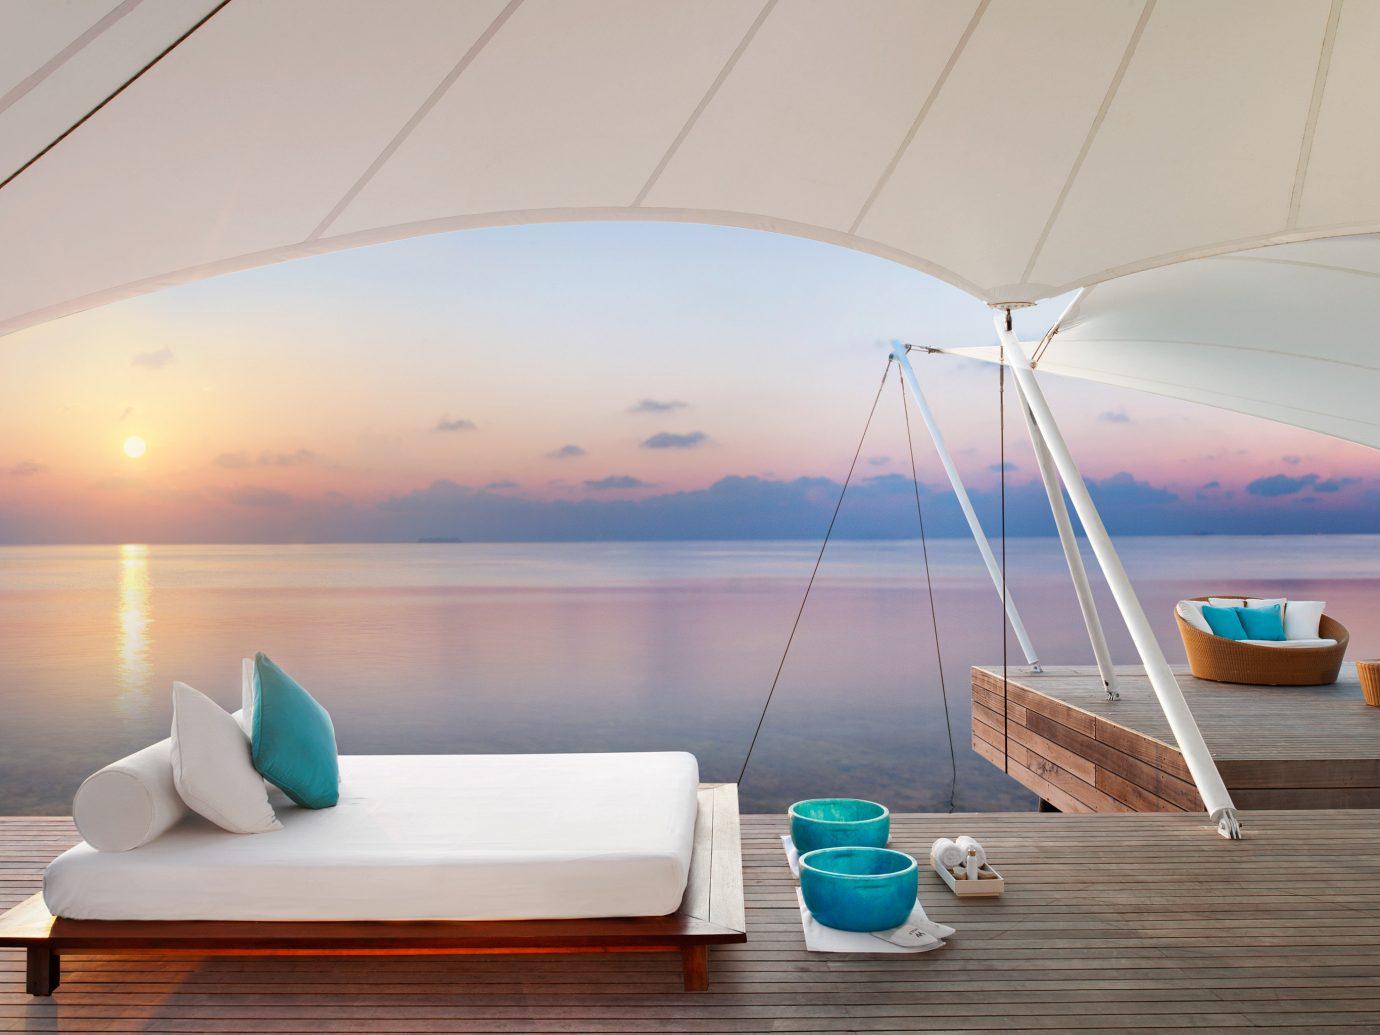 Elegant Living Lounge Luxury Ocean Overwater Bungalow Trip Ideas indoor Boat Architecture yacht lighting interior design ceiling Design swimming pool